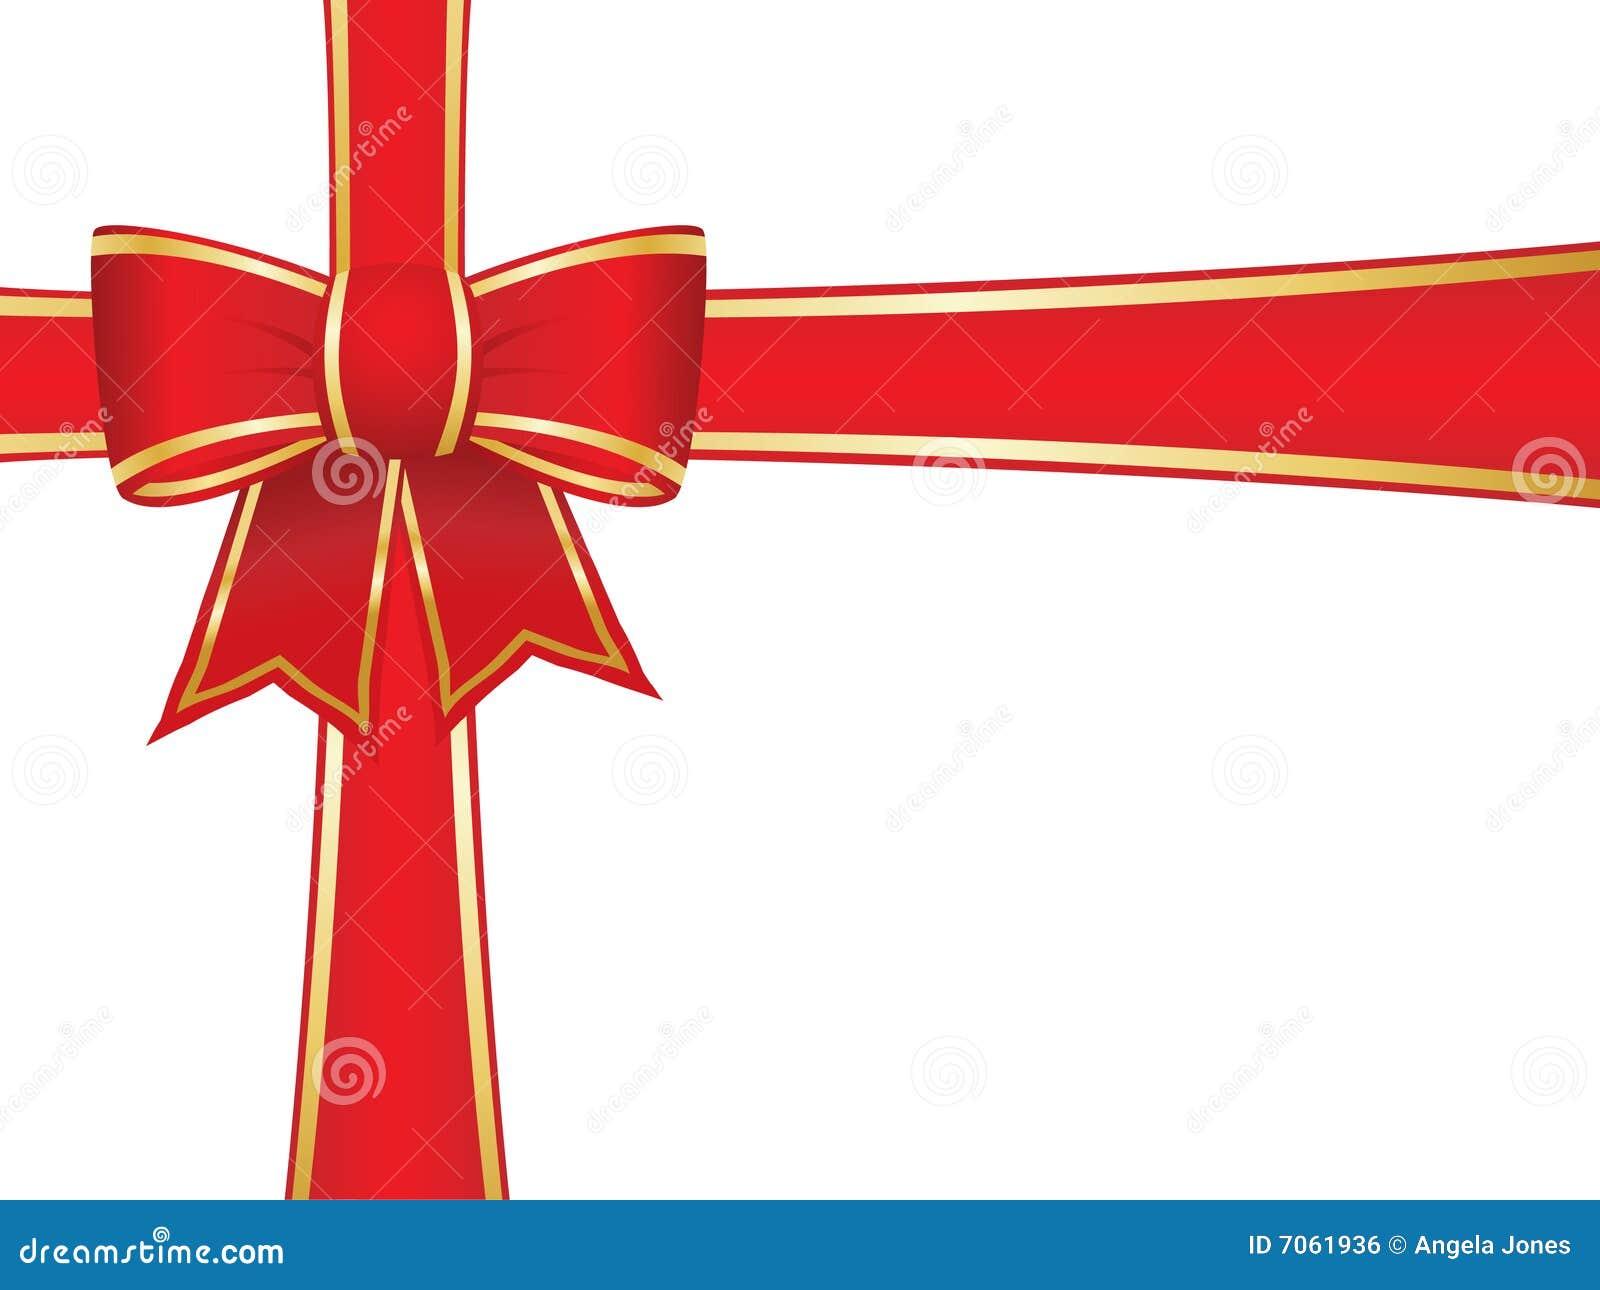 Christmas bow and ribbons royalty free stock image